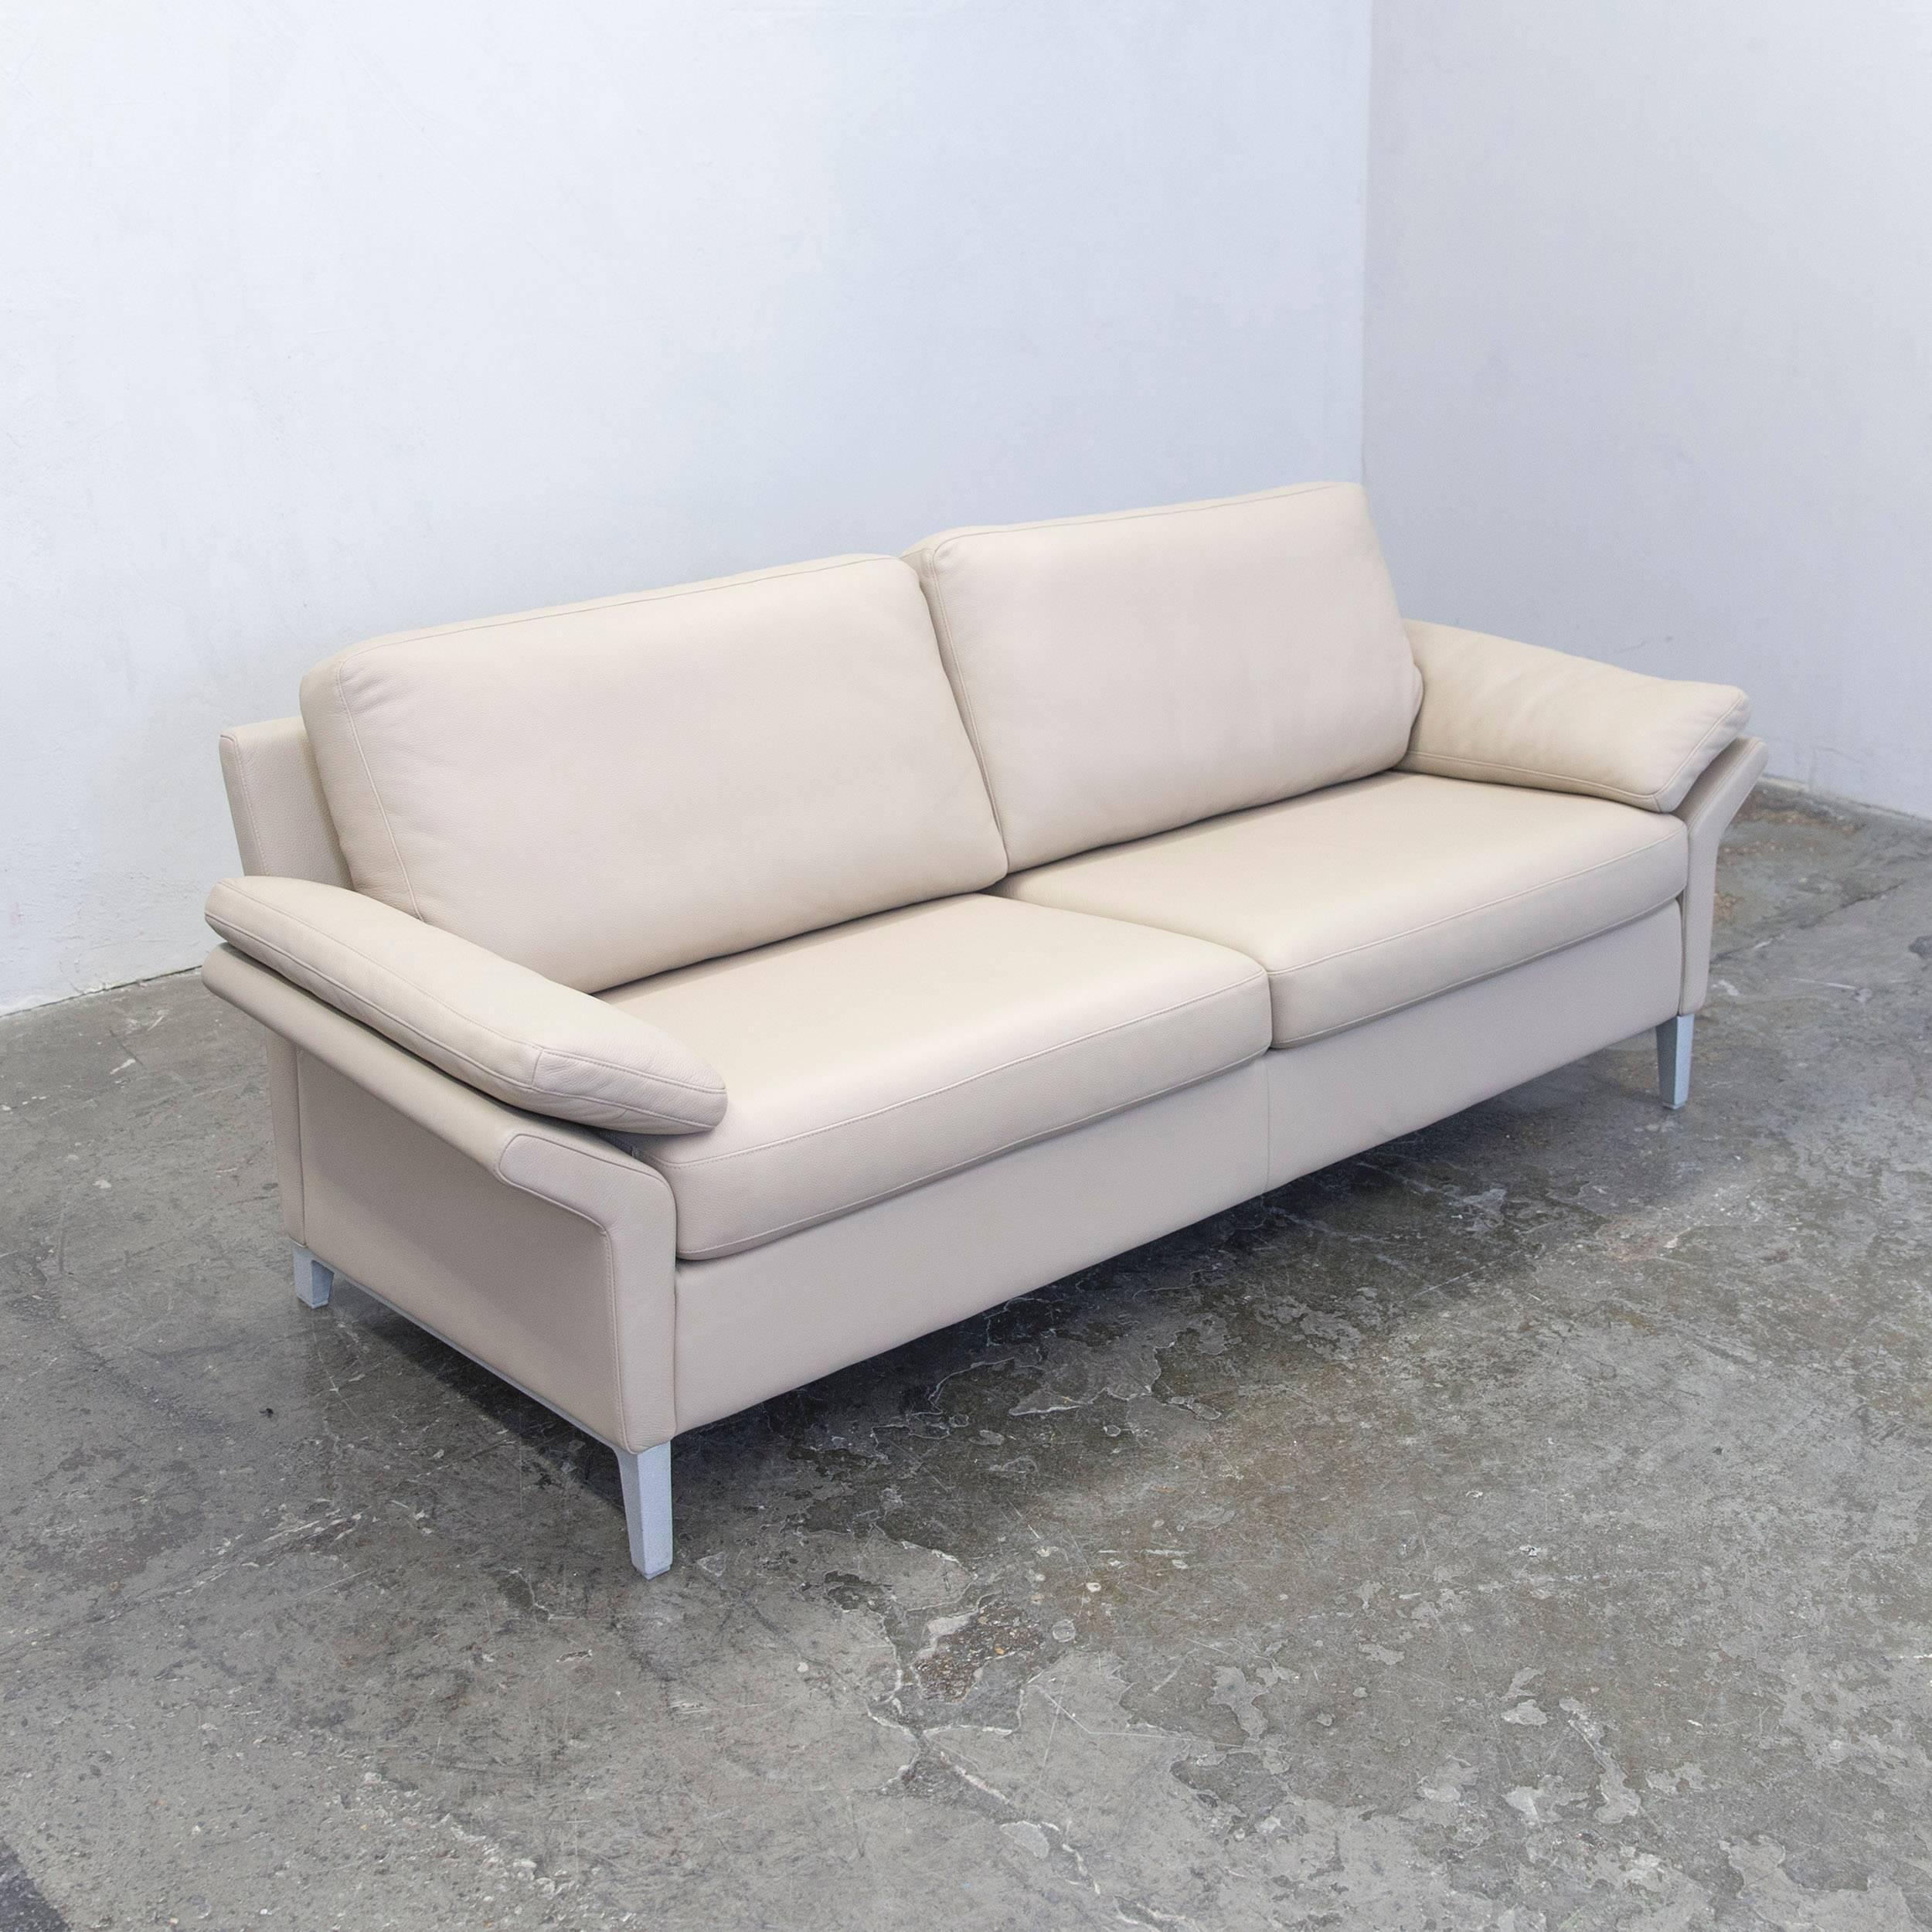 rolf benz sofa zweisitzer. Black Bedroom Furniture Sets. Home Design Ideas